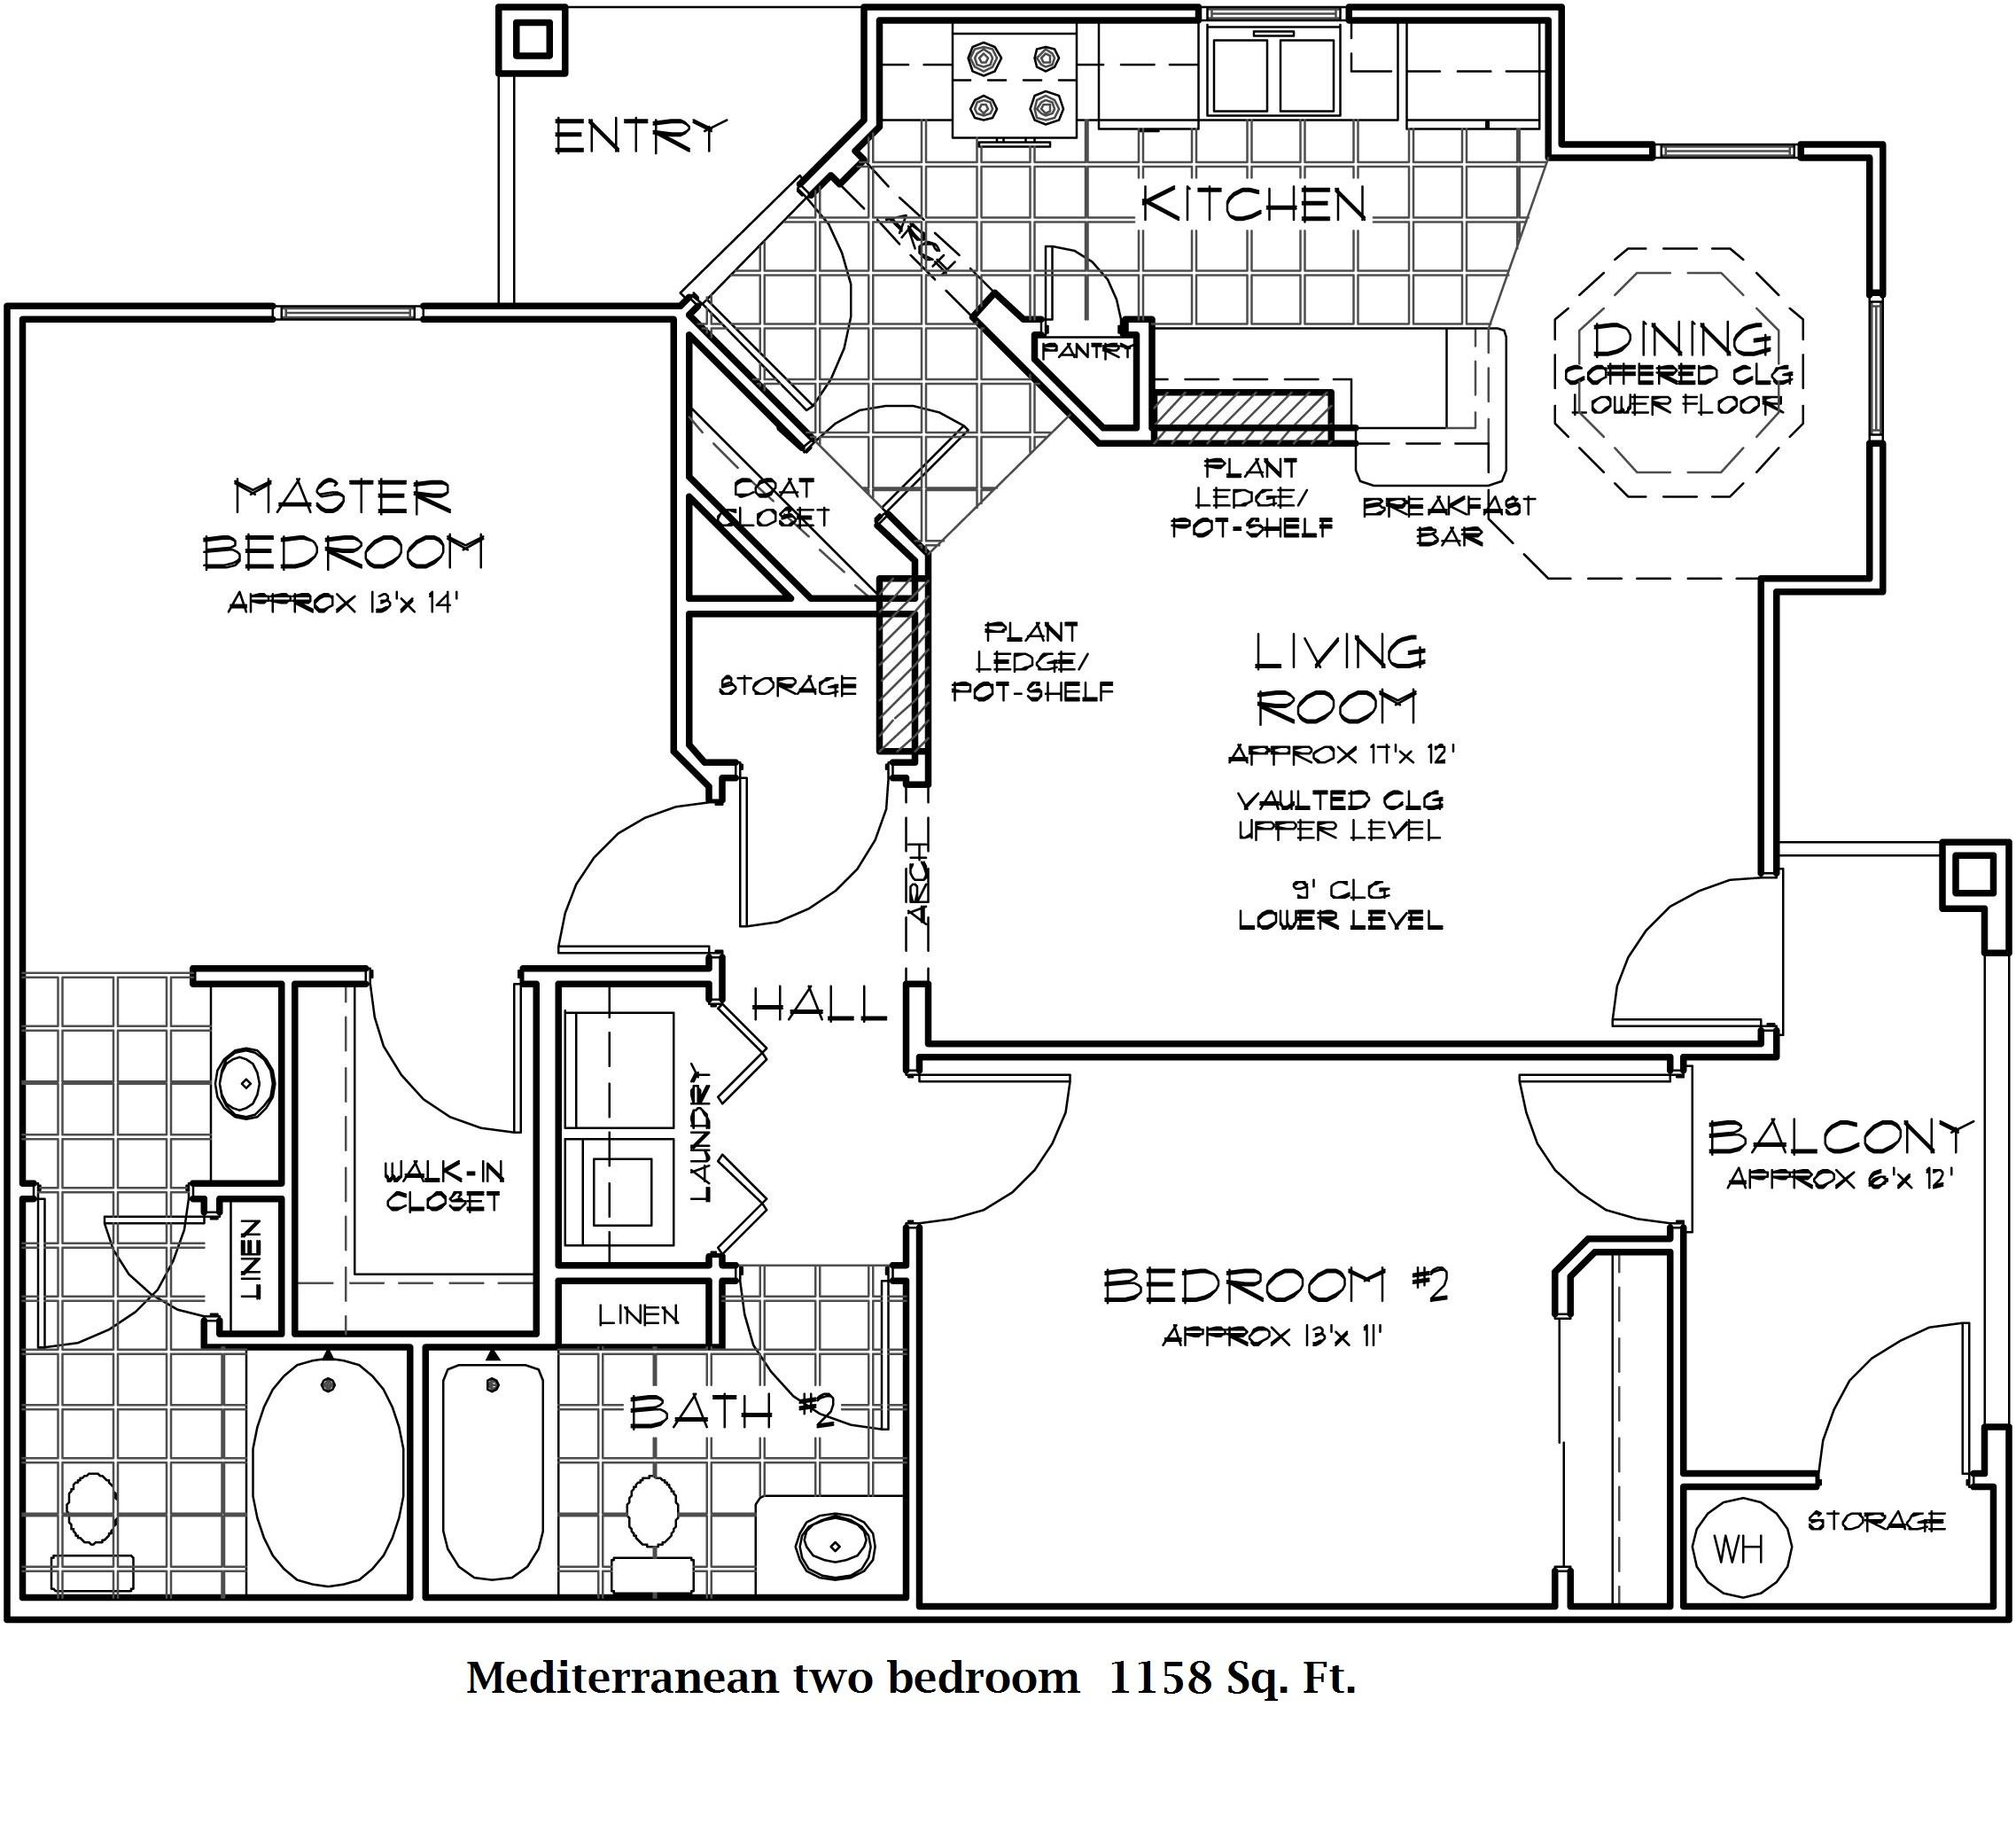 The Mediterranean - Two Bedroom